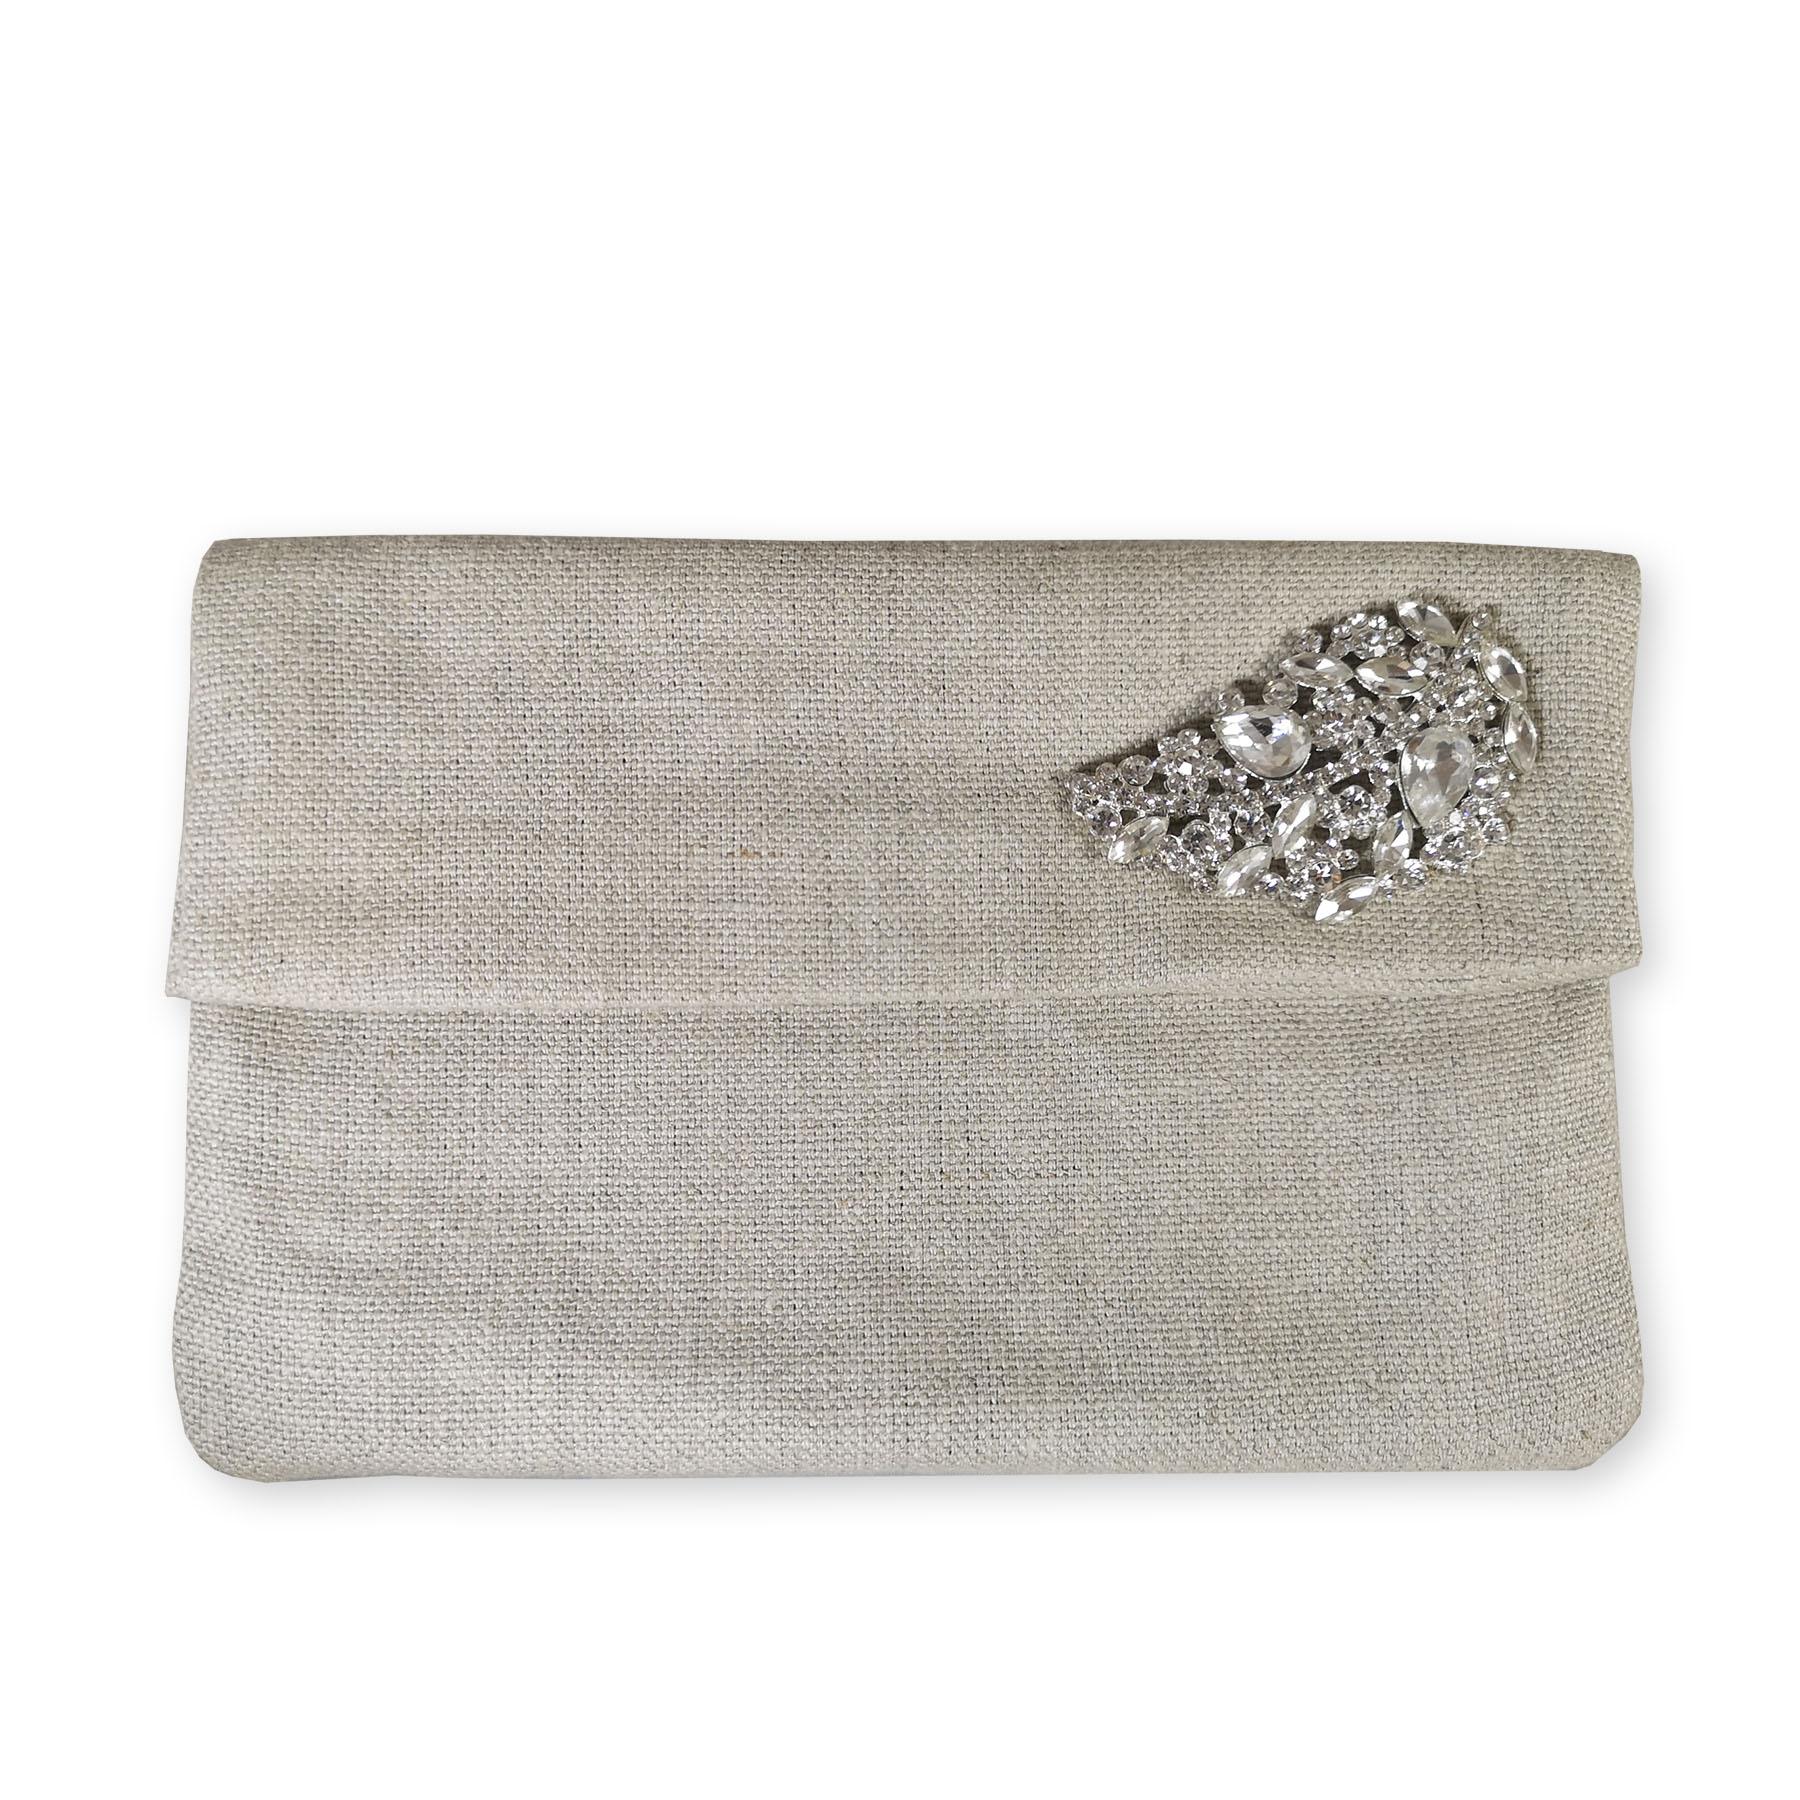 Linen clutch envelope